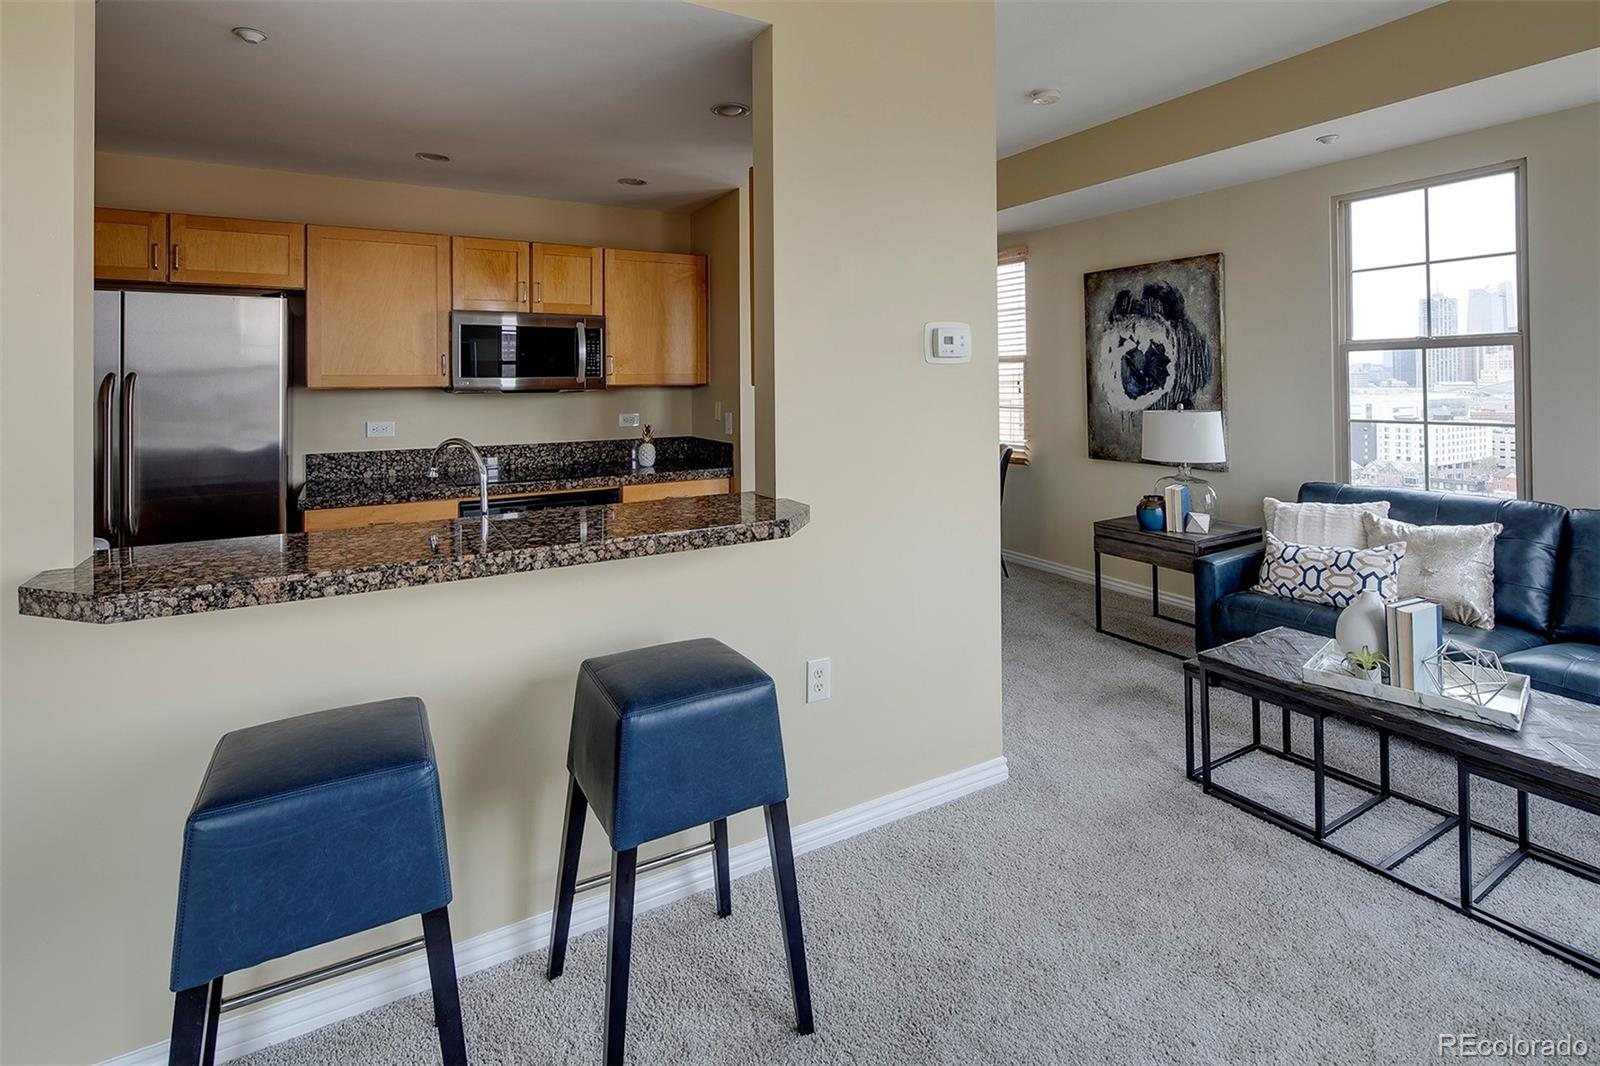 MLS# 2799823 - 2 - 300 W 11th Avenue #16A, Denver, CO 80204